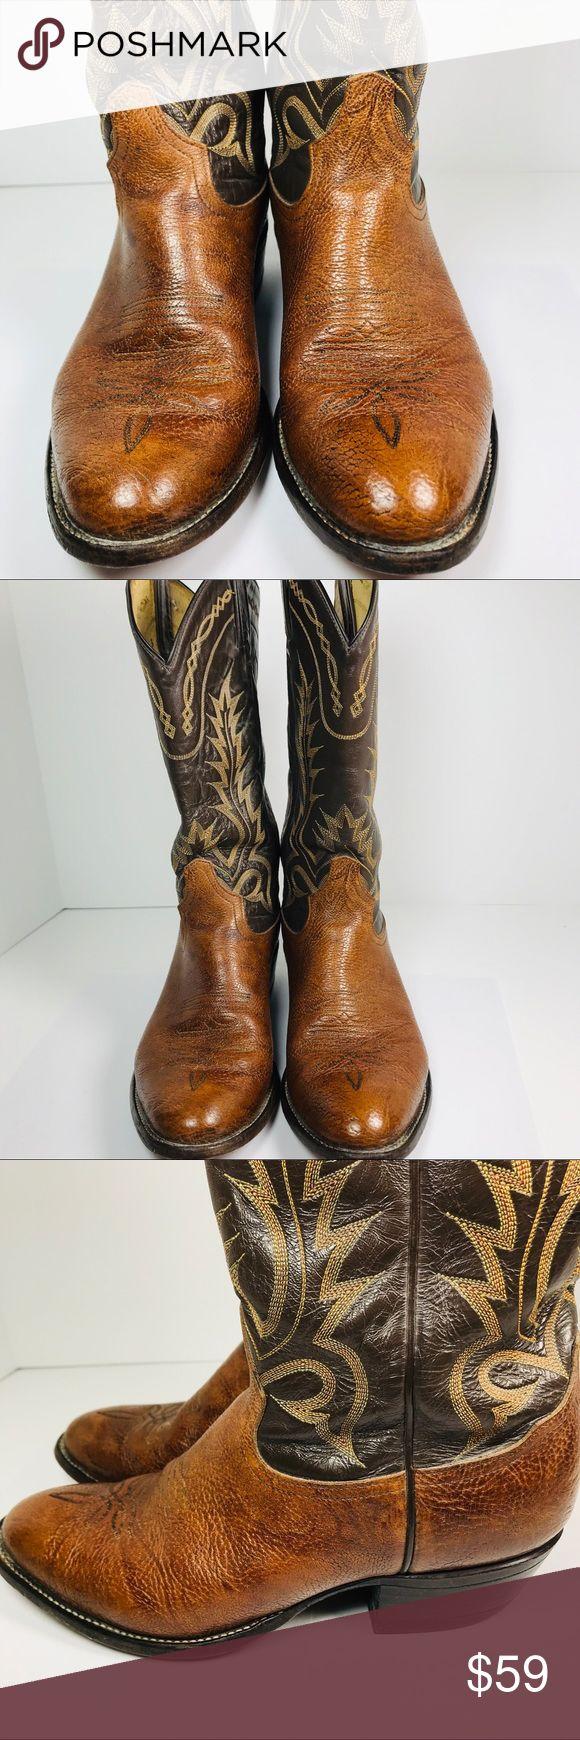 d954a4872ee Tony Lama boots Aztec size 8EE western cowboy MENS Light